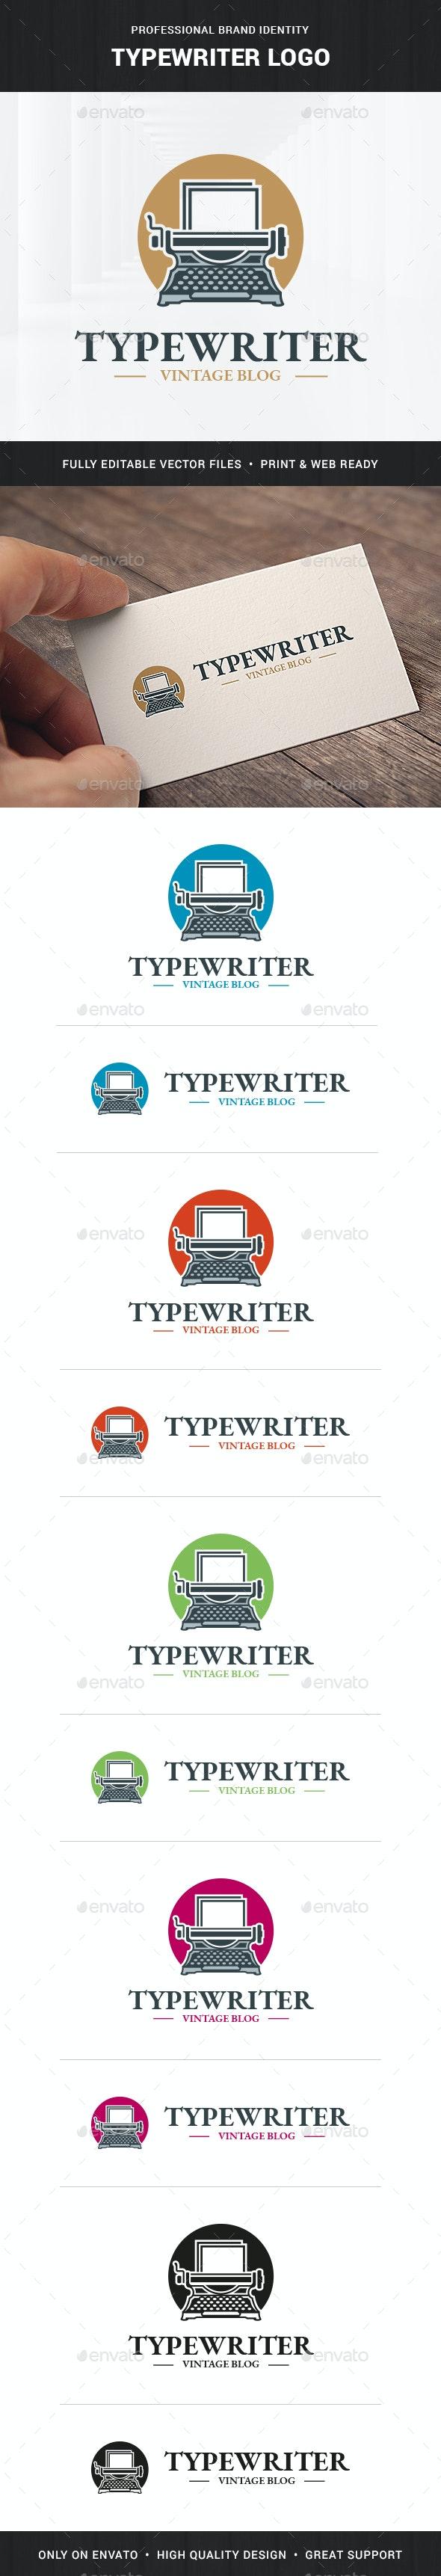 Typewriter Logo Template - Objects Logo Templates